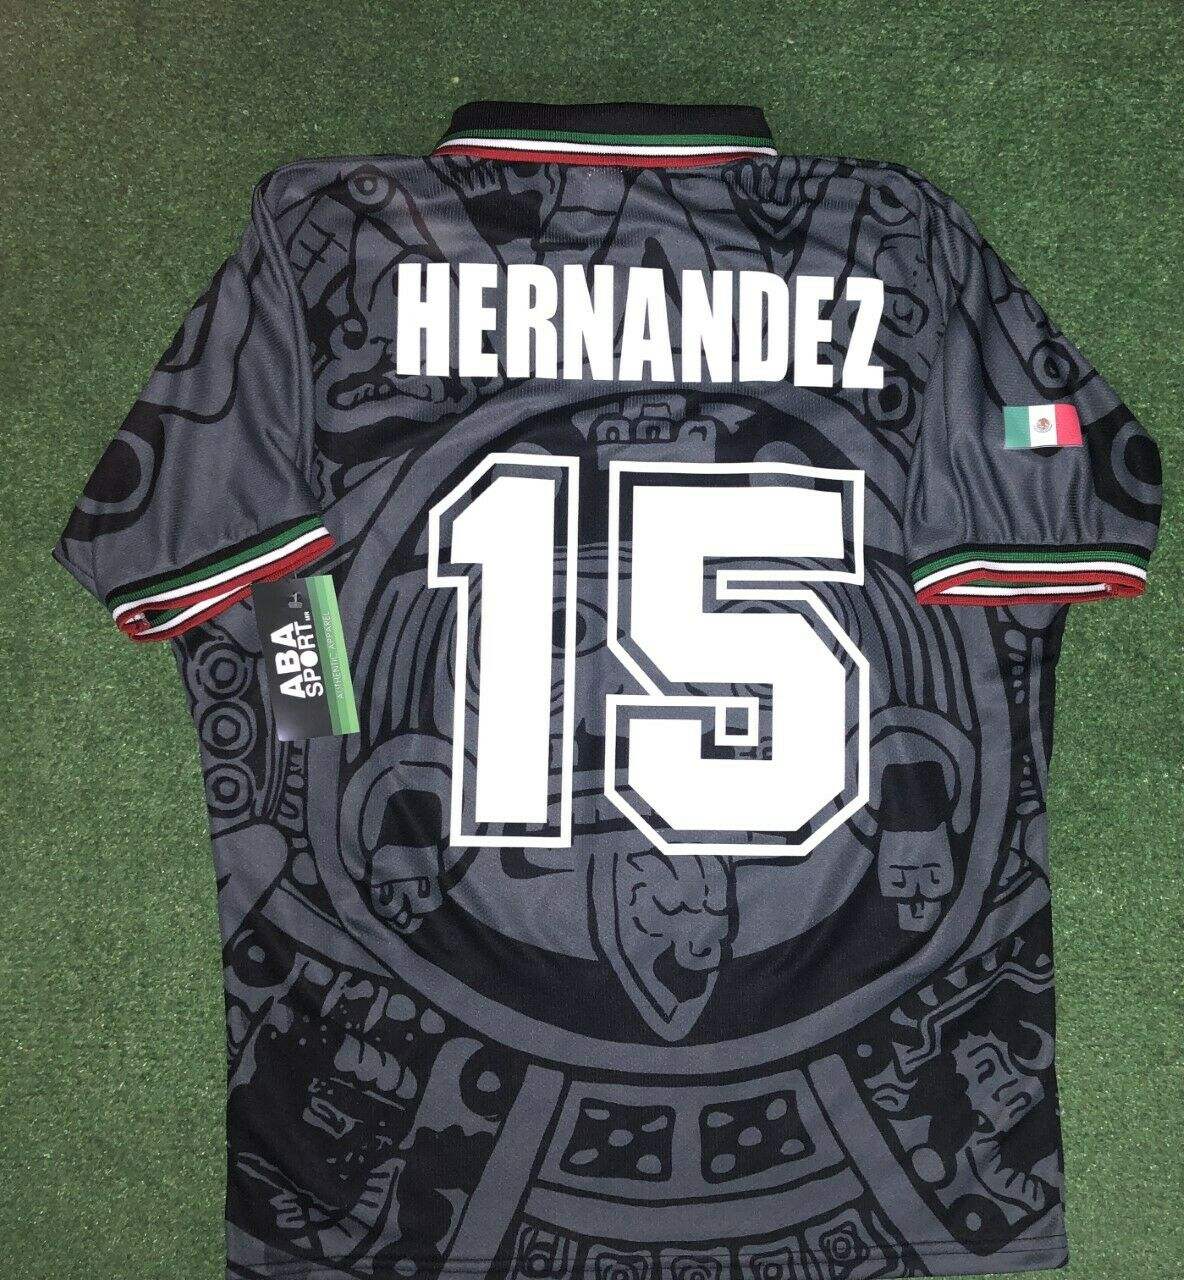 MEXICO1998 Luis Hernadez, Edición De Gala Talla Xl, auténtico Camisa Aba Sport